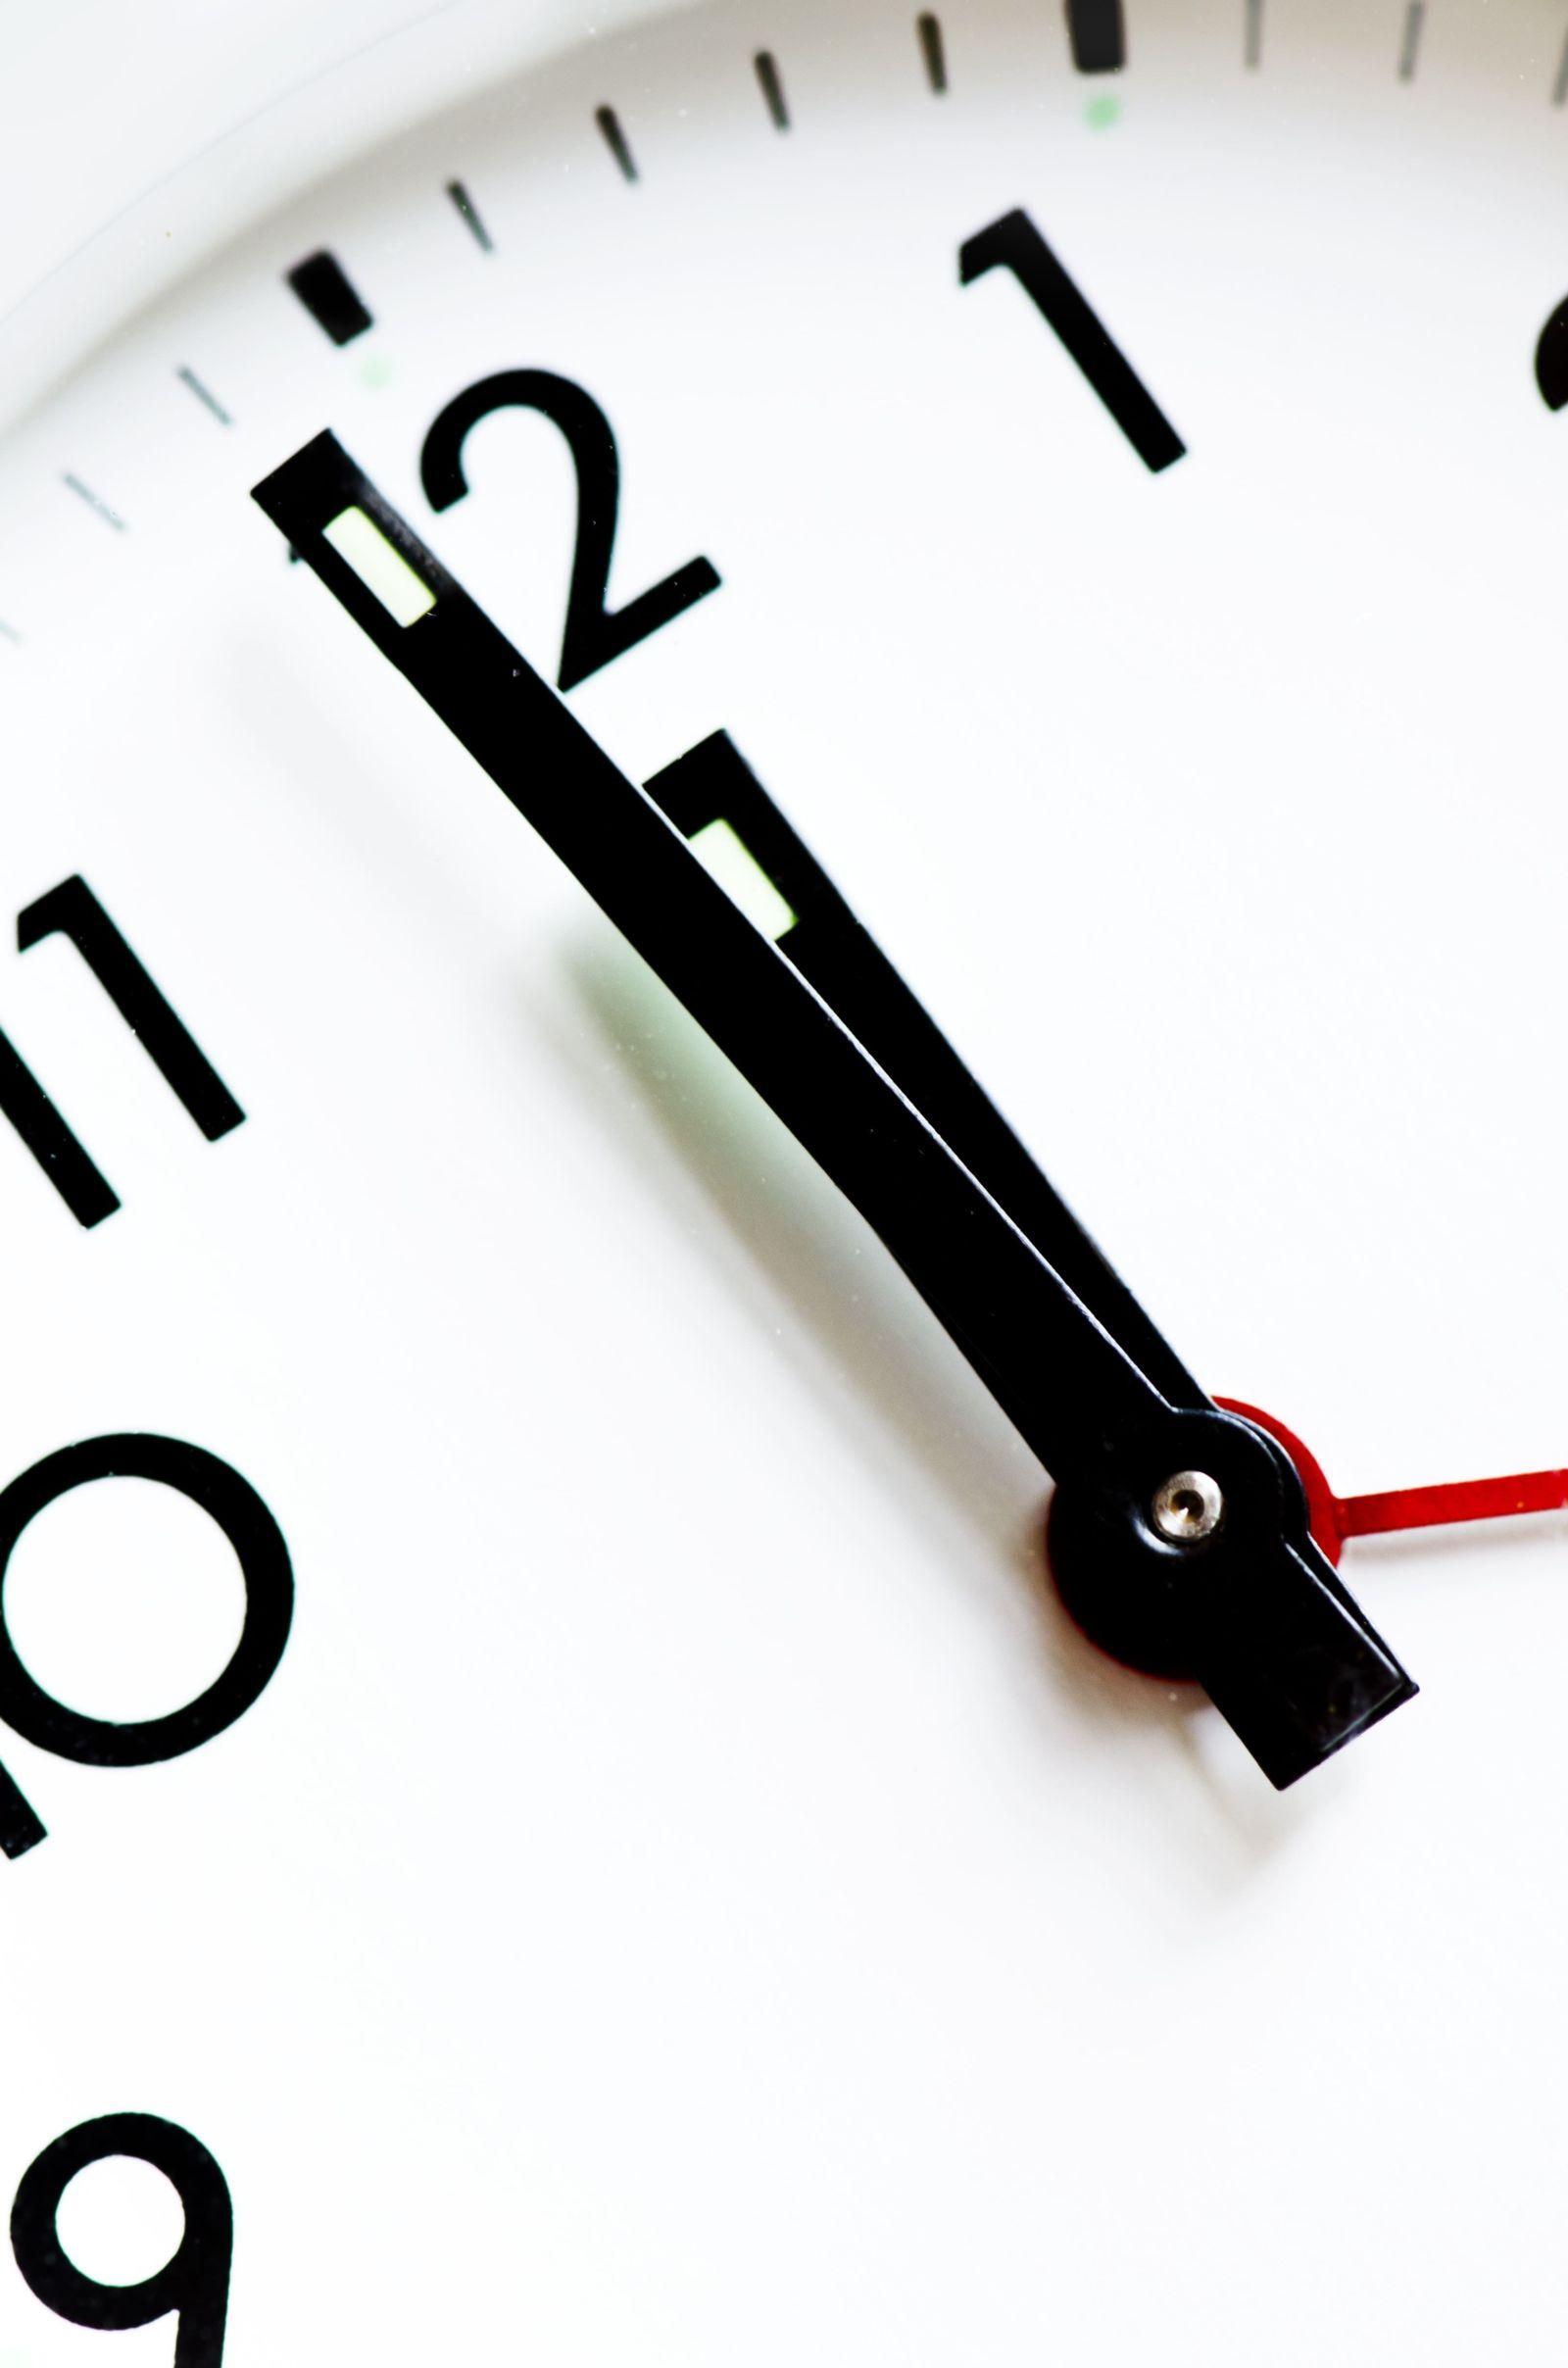 black and white analog clock showing 11:59